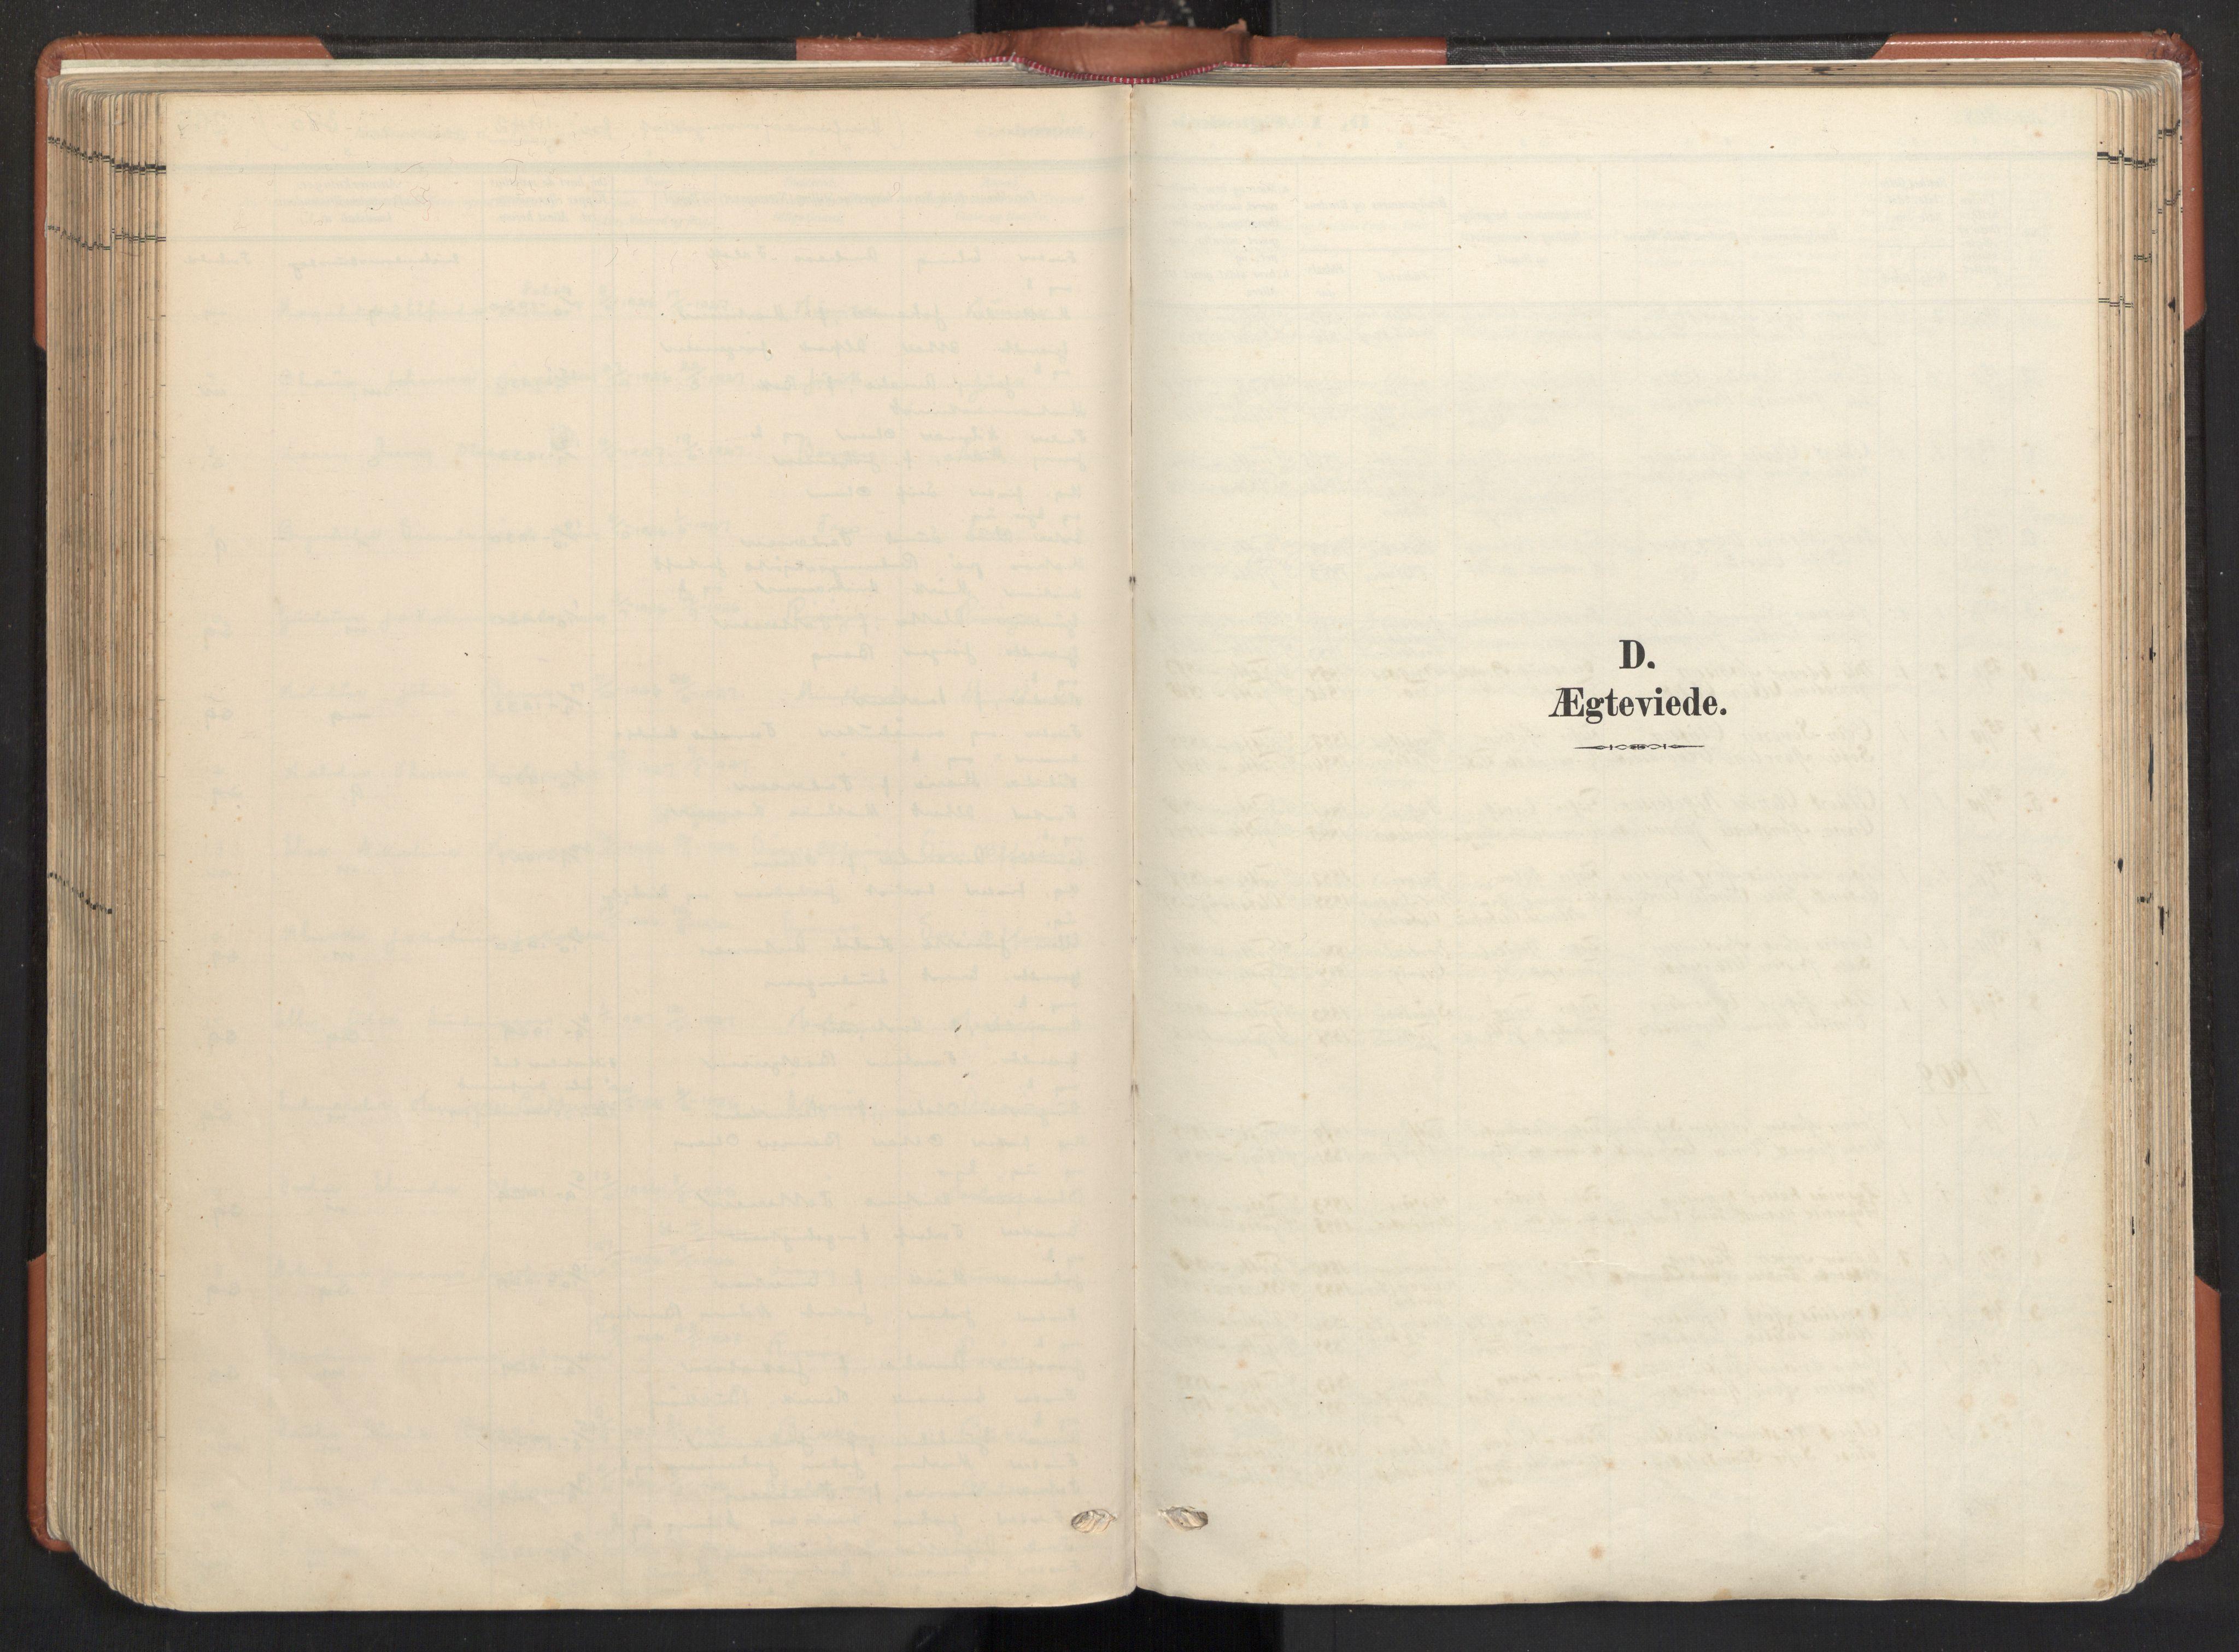 SAT, Ministerialprotokoller, klokkerbøker og fødselsregistre - Nordland, 817/L0265: Ministerialbok nr. 817A05, 1908-1944